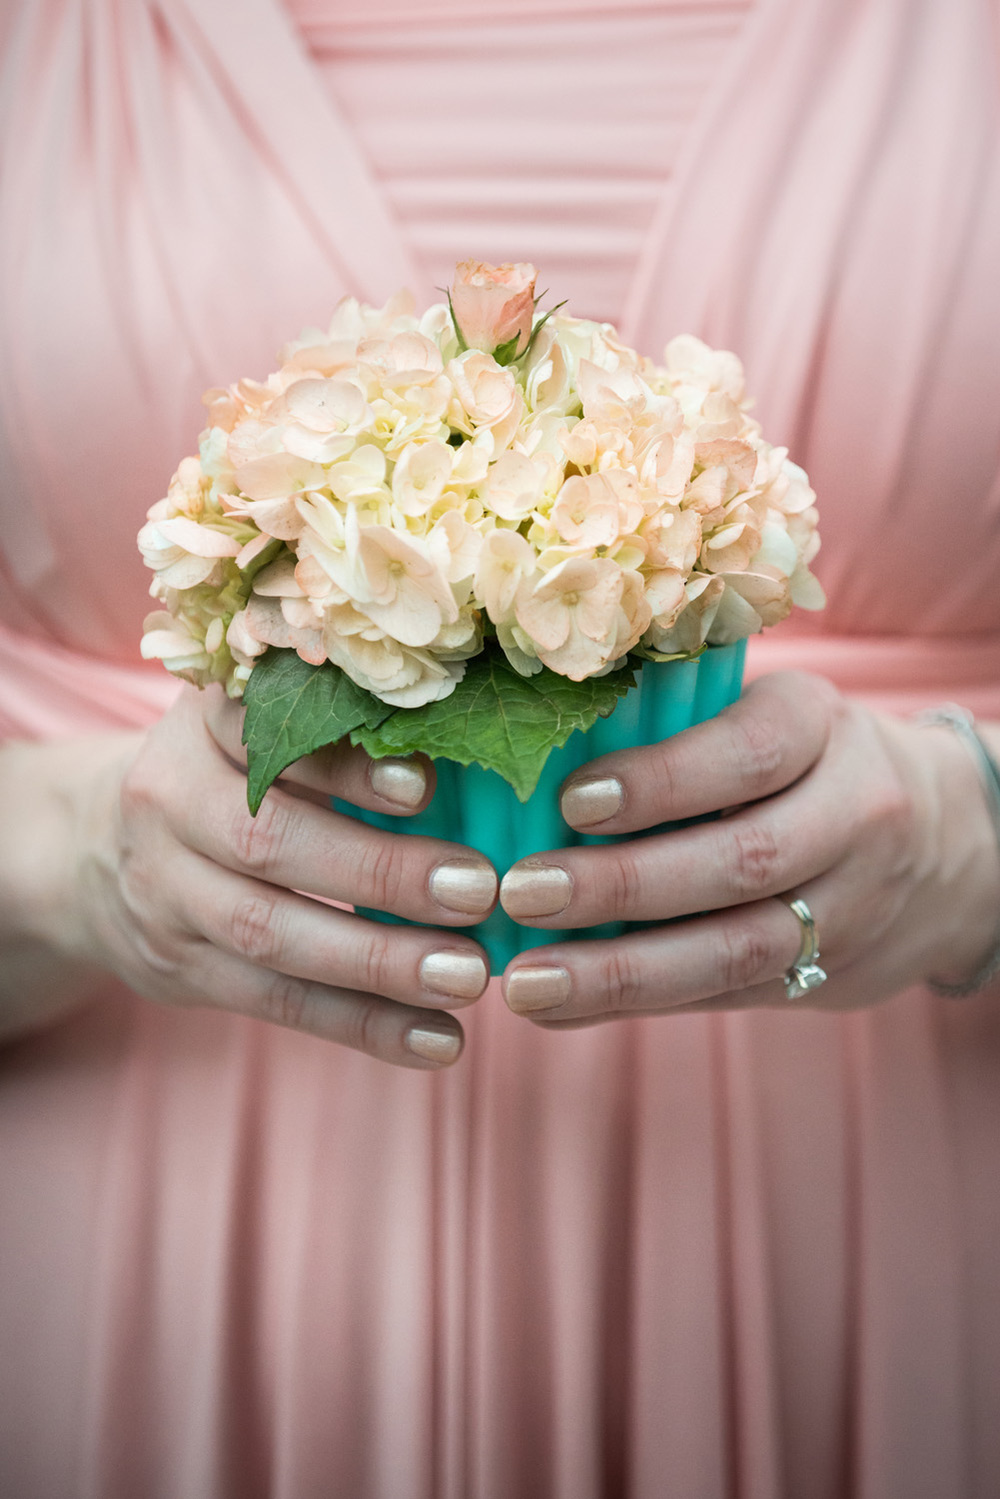 diy_realwedding_bouquet_bridesmaid_flowers